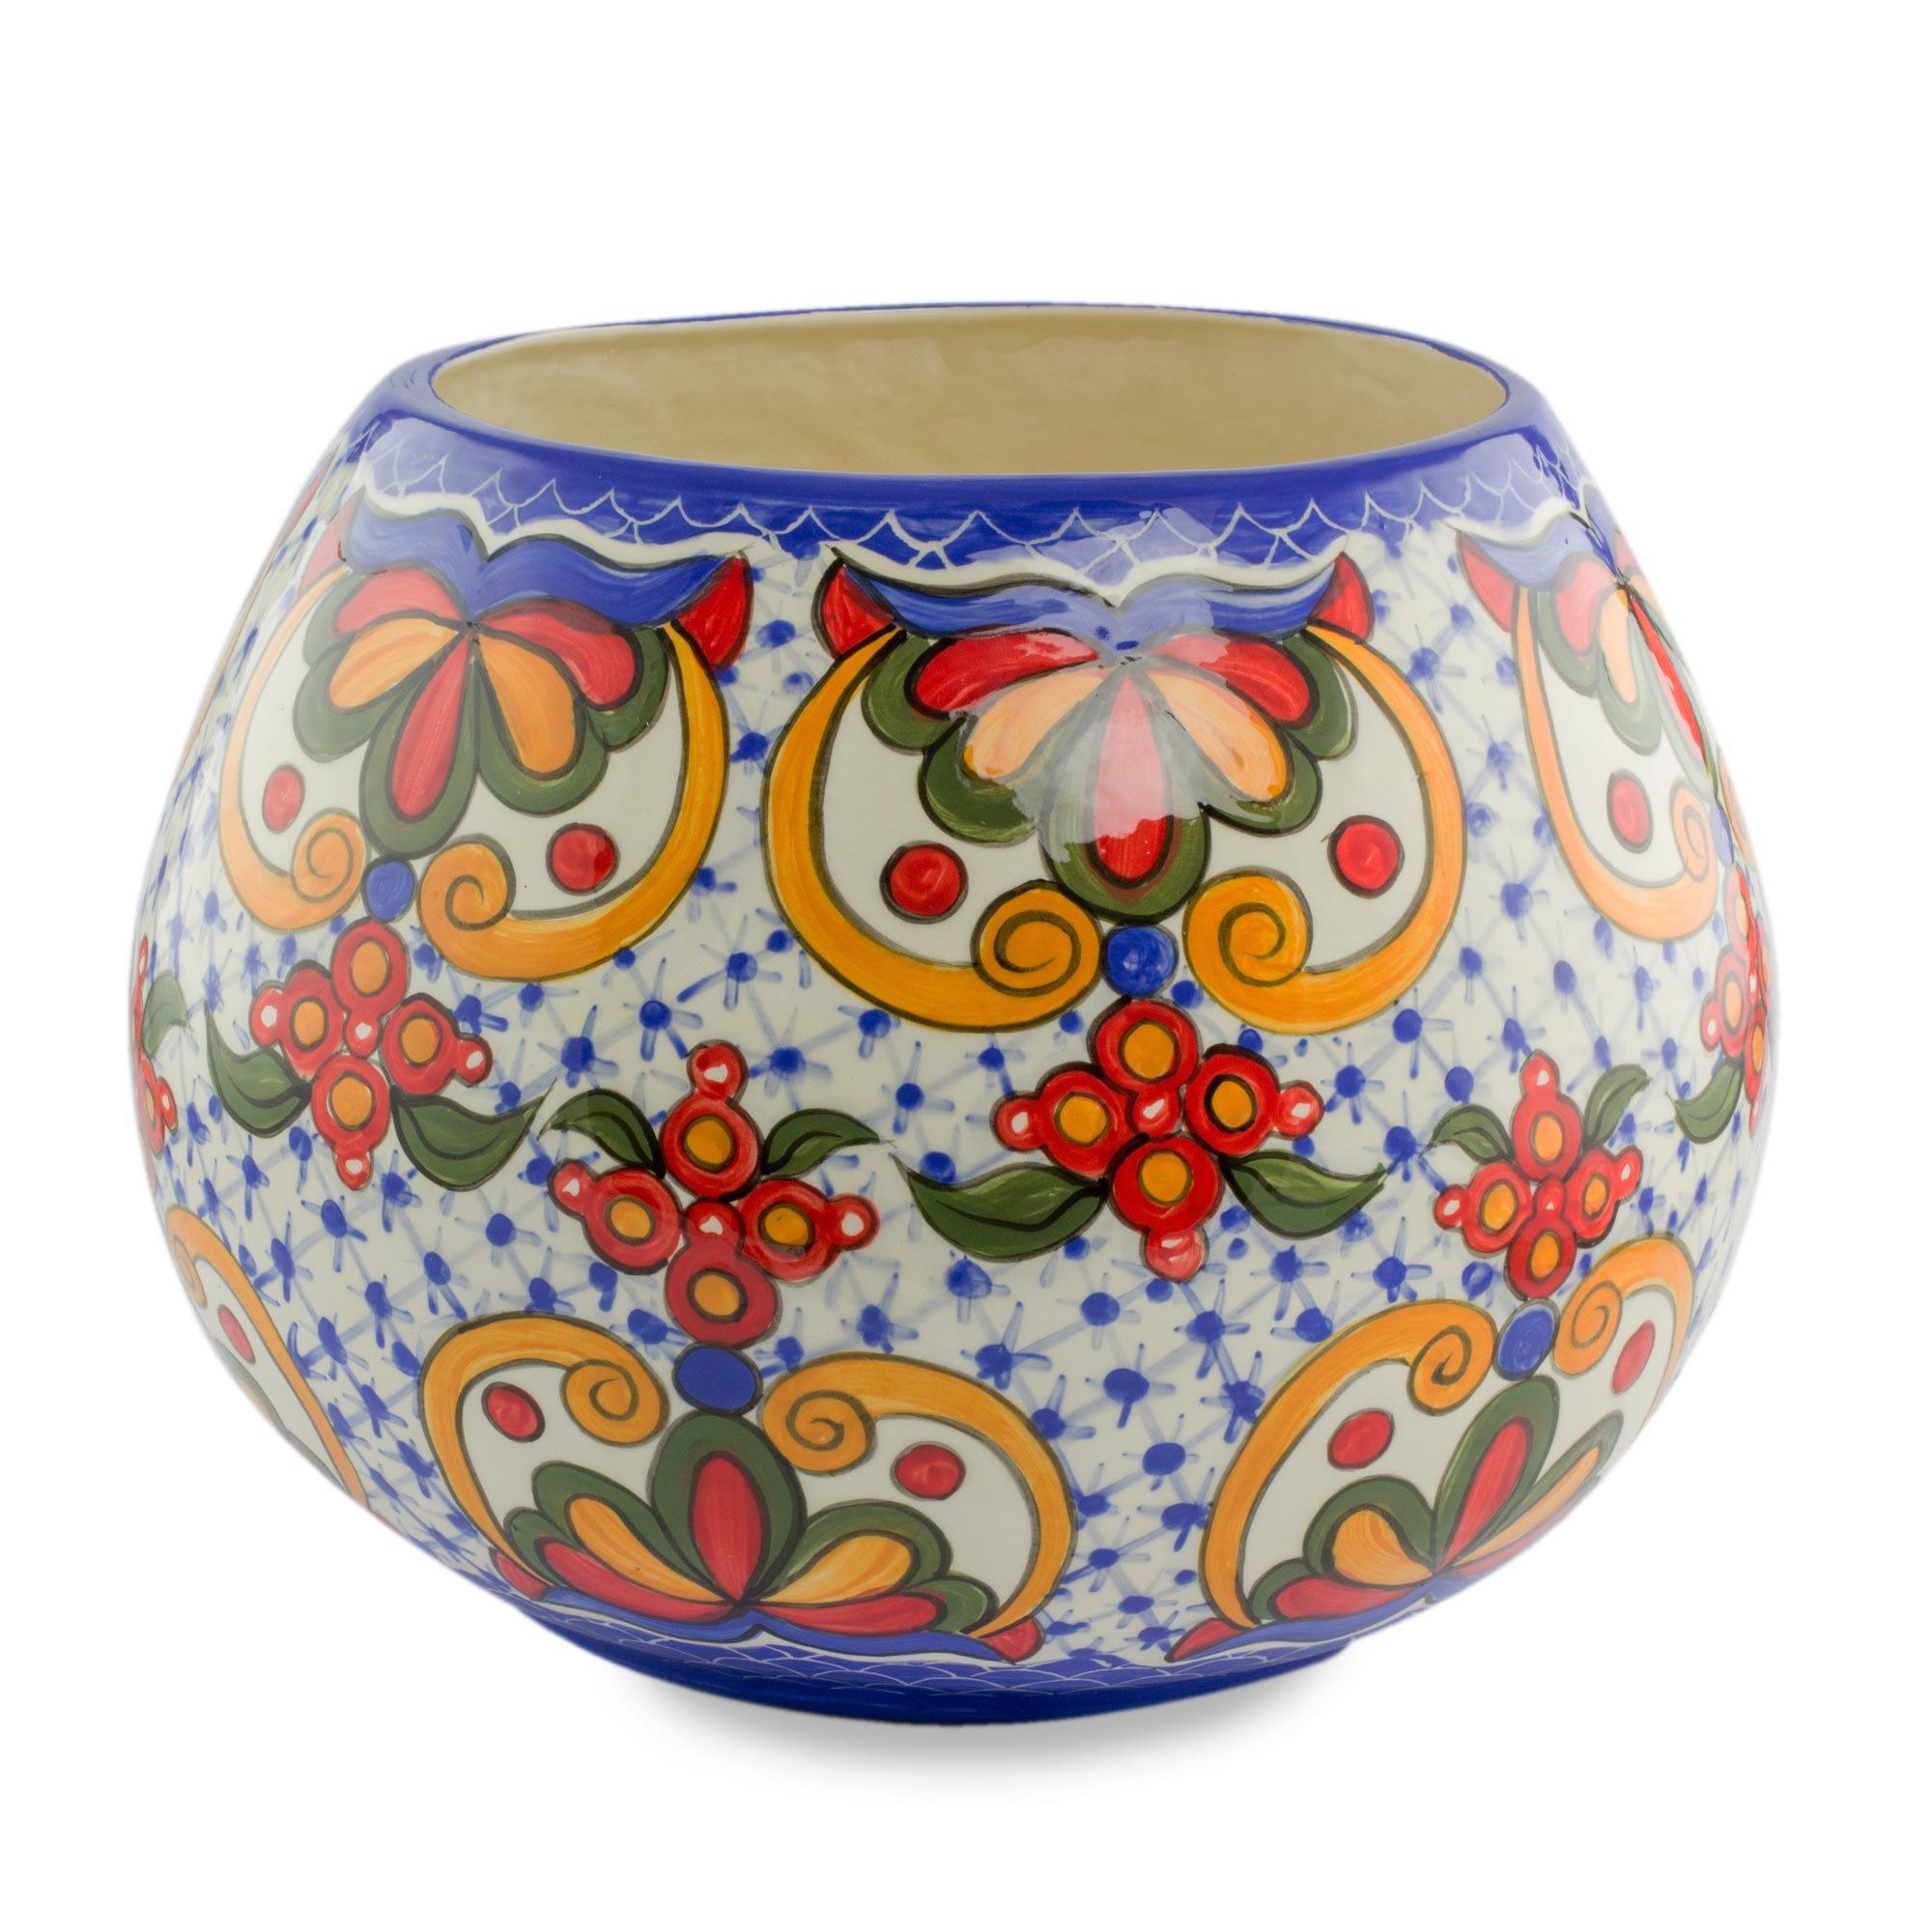 NOVICA Floral Ceramic Vase, Multicolor 'Florid Sheen' by NOVICA